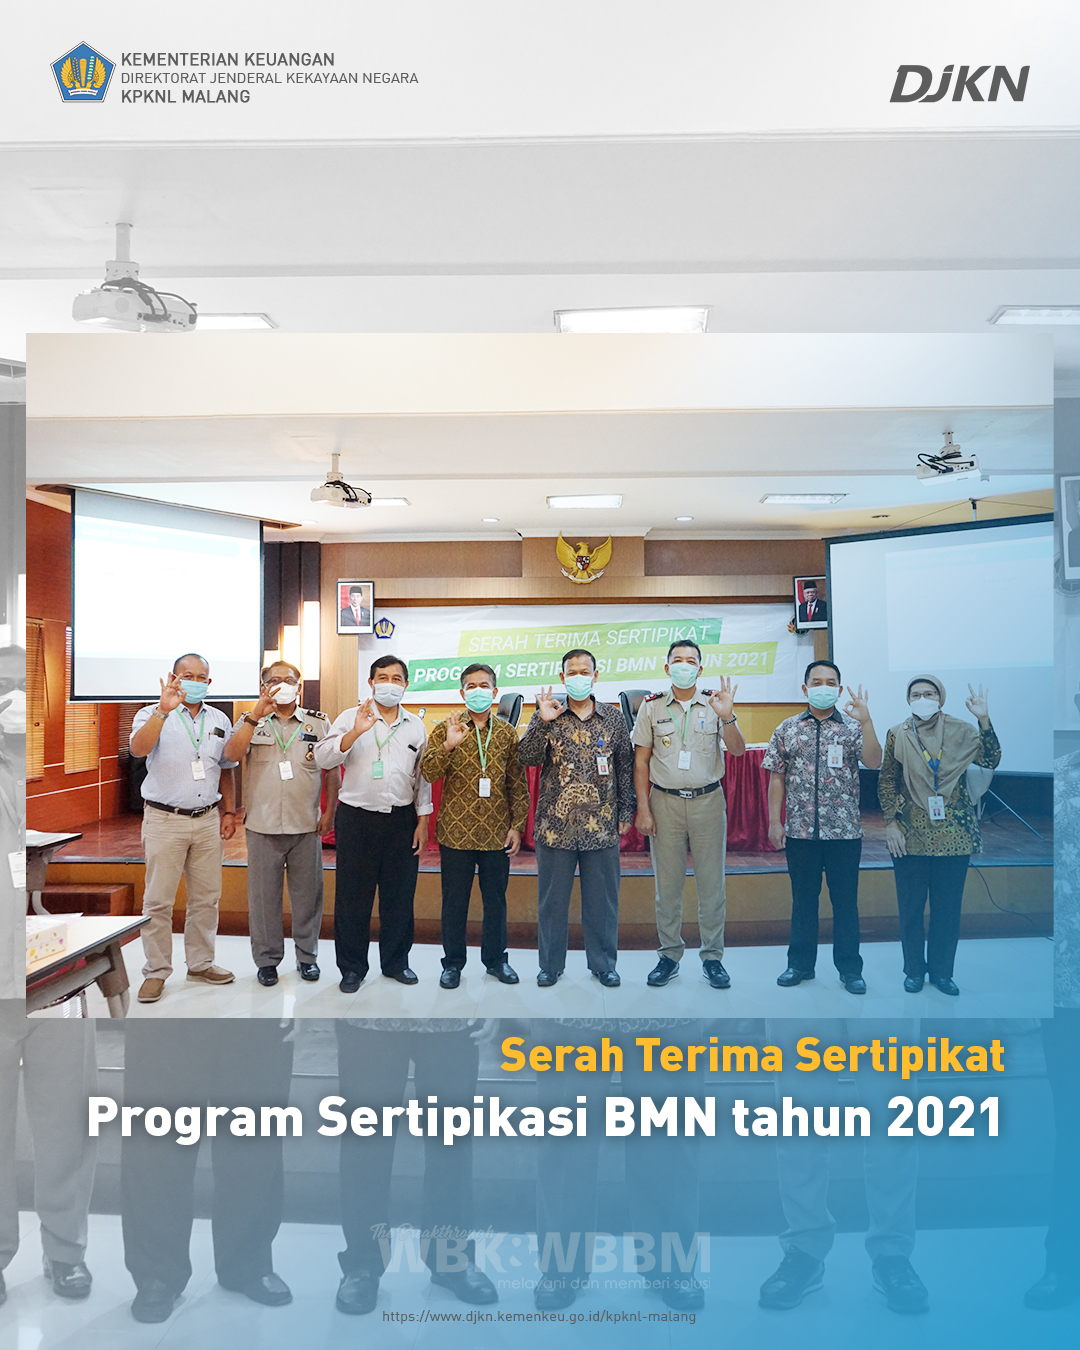 Serah Terima Sertipikat Program Sertipikasi BMN Tahun 2021